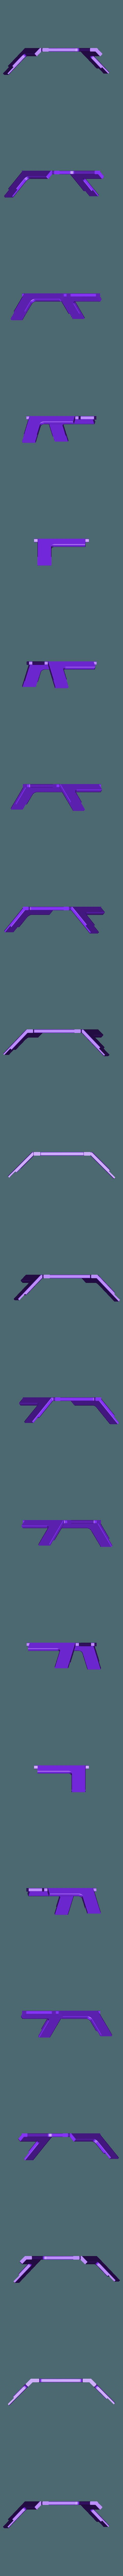 Box_Side.STL Download free STL file Automata-4 Ben rides around the clock • 3D printer template, woodenclocks